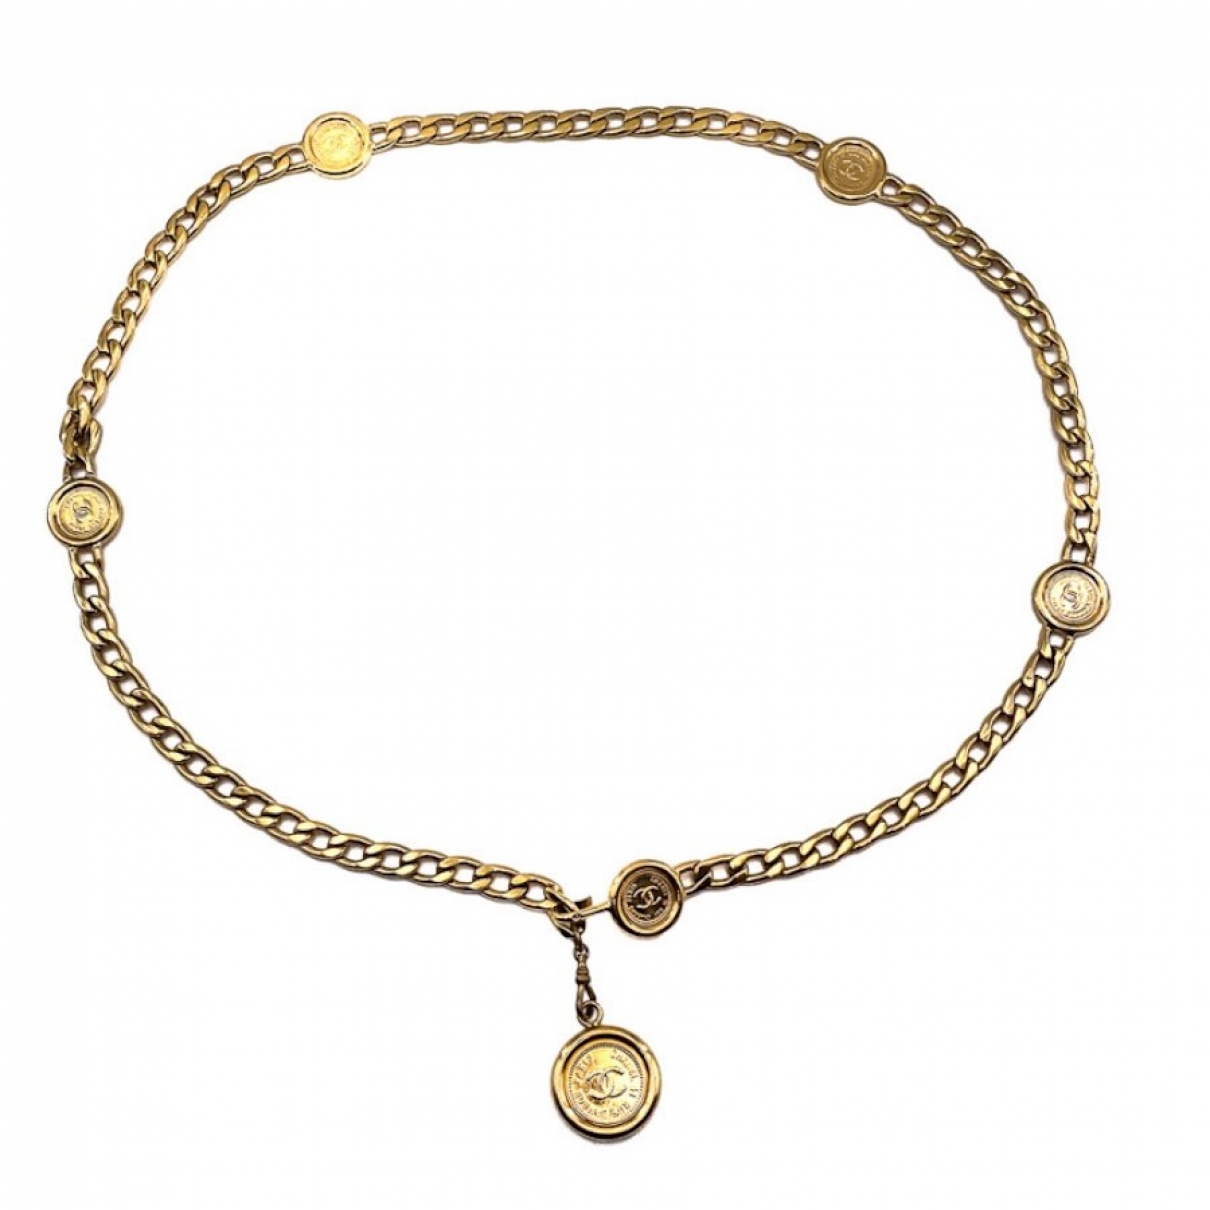 Chanel \N Gold Metal belt for Women M International